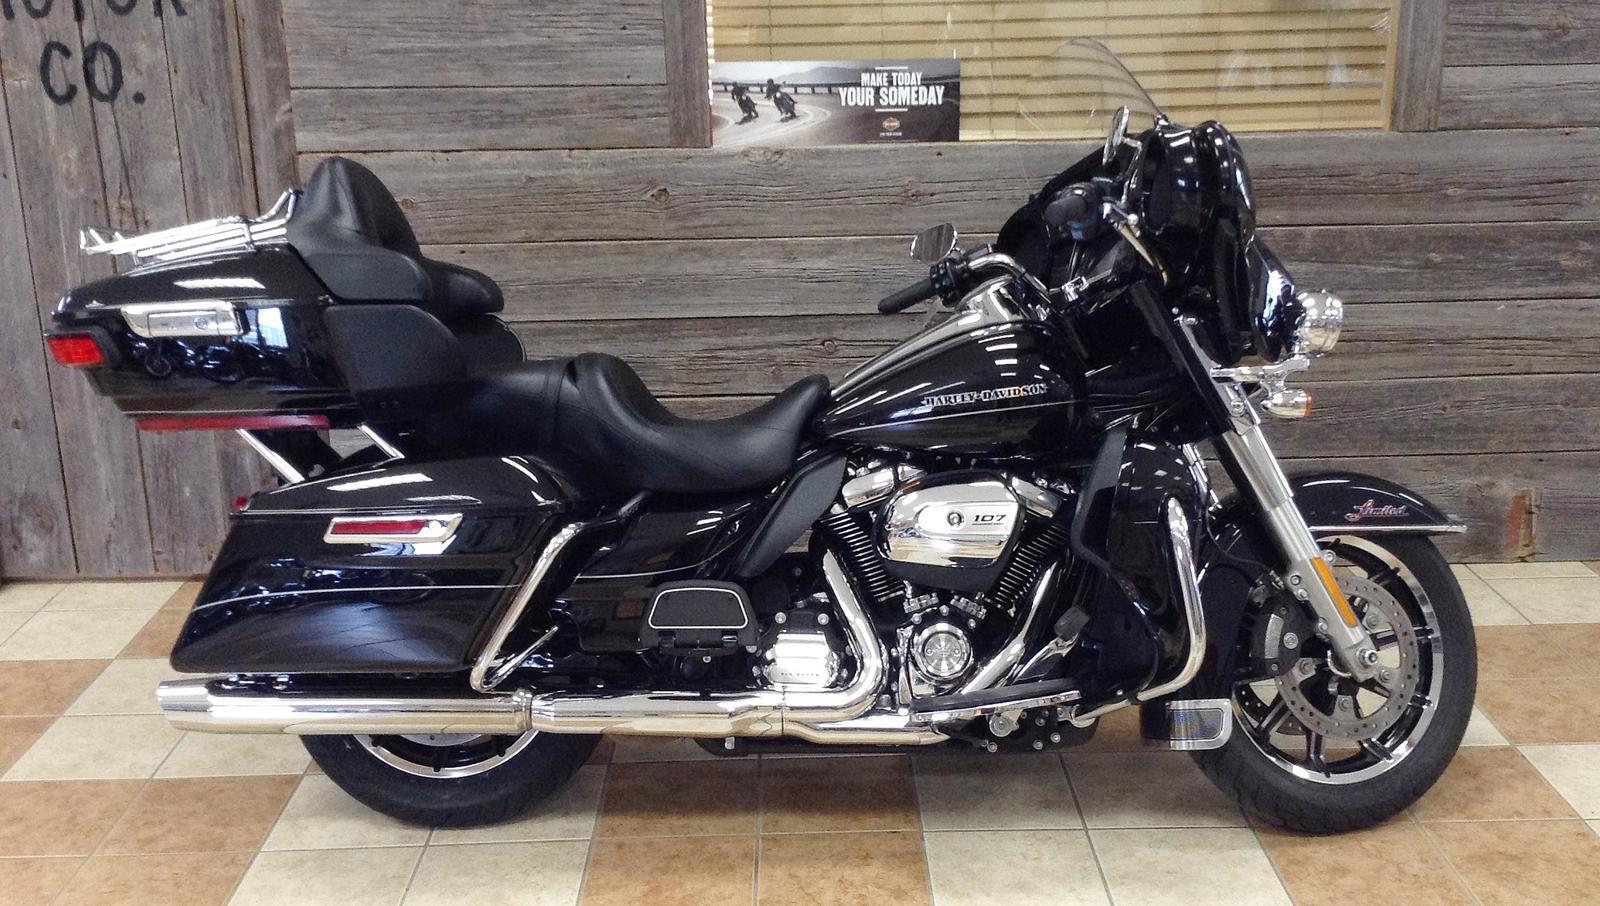 2017 Harley Davidson Flhtk Ultra Limited For Sale In Bonduel Wi Docs Of Shawano County 715 758 9080